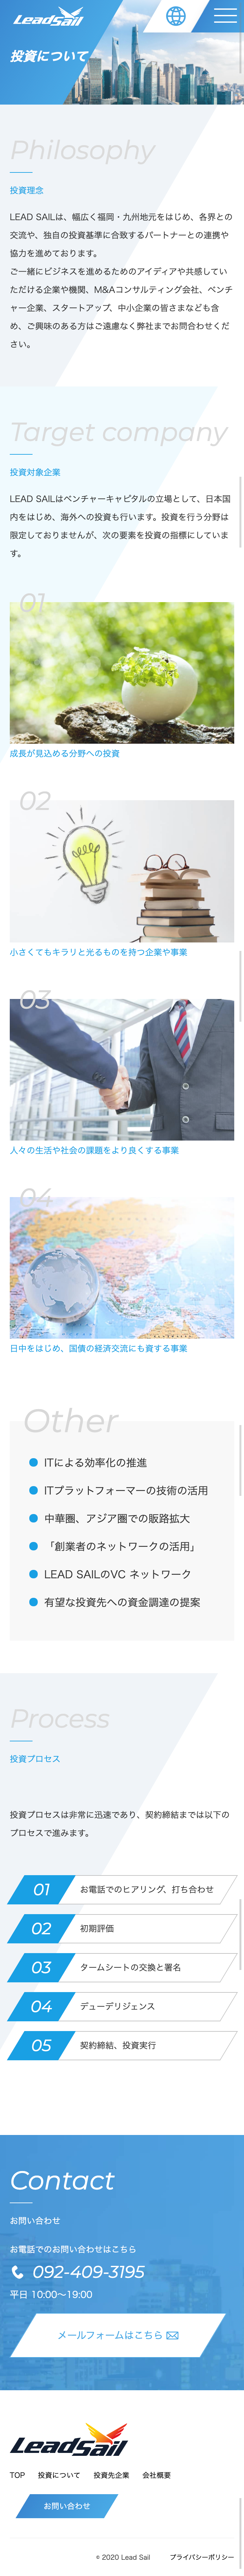 株式会社Lead Sail様 SP画像